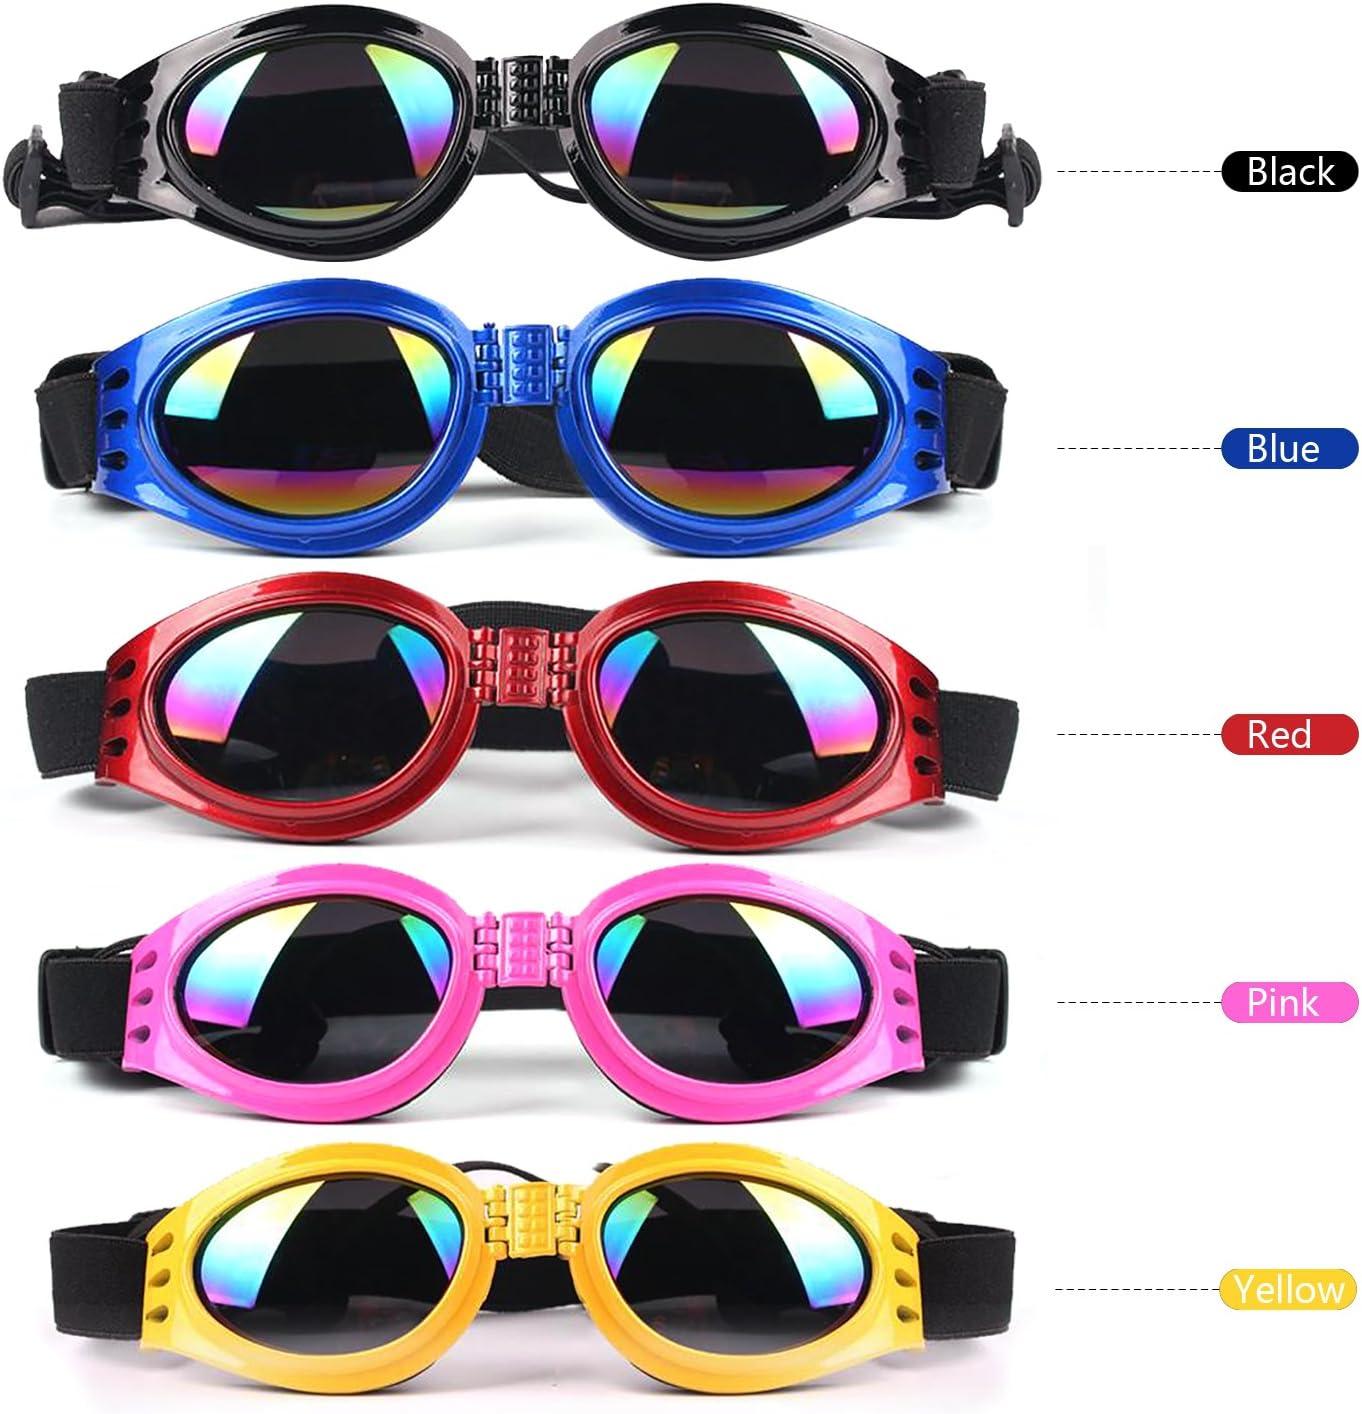 TM SlimArmor Fashion Pet Dog Puppy Goggles Sunglasses Eye Wear Protection Folding Goggles 5 Colors Black